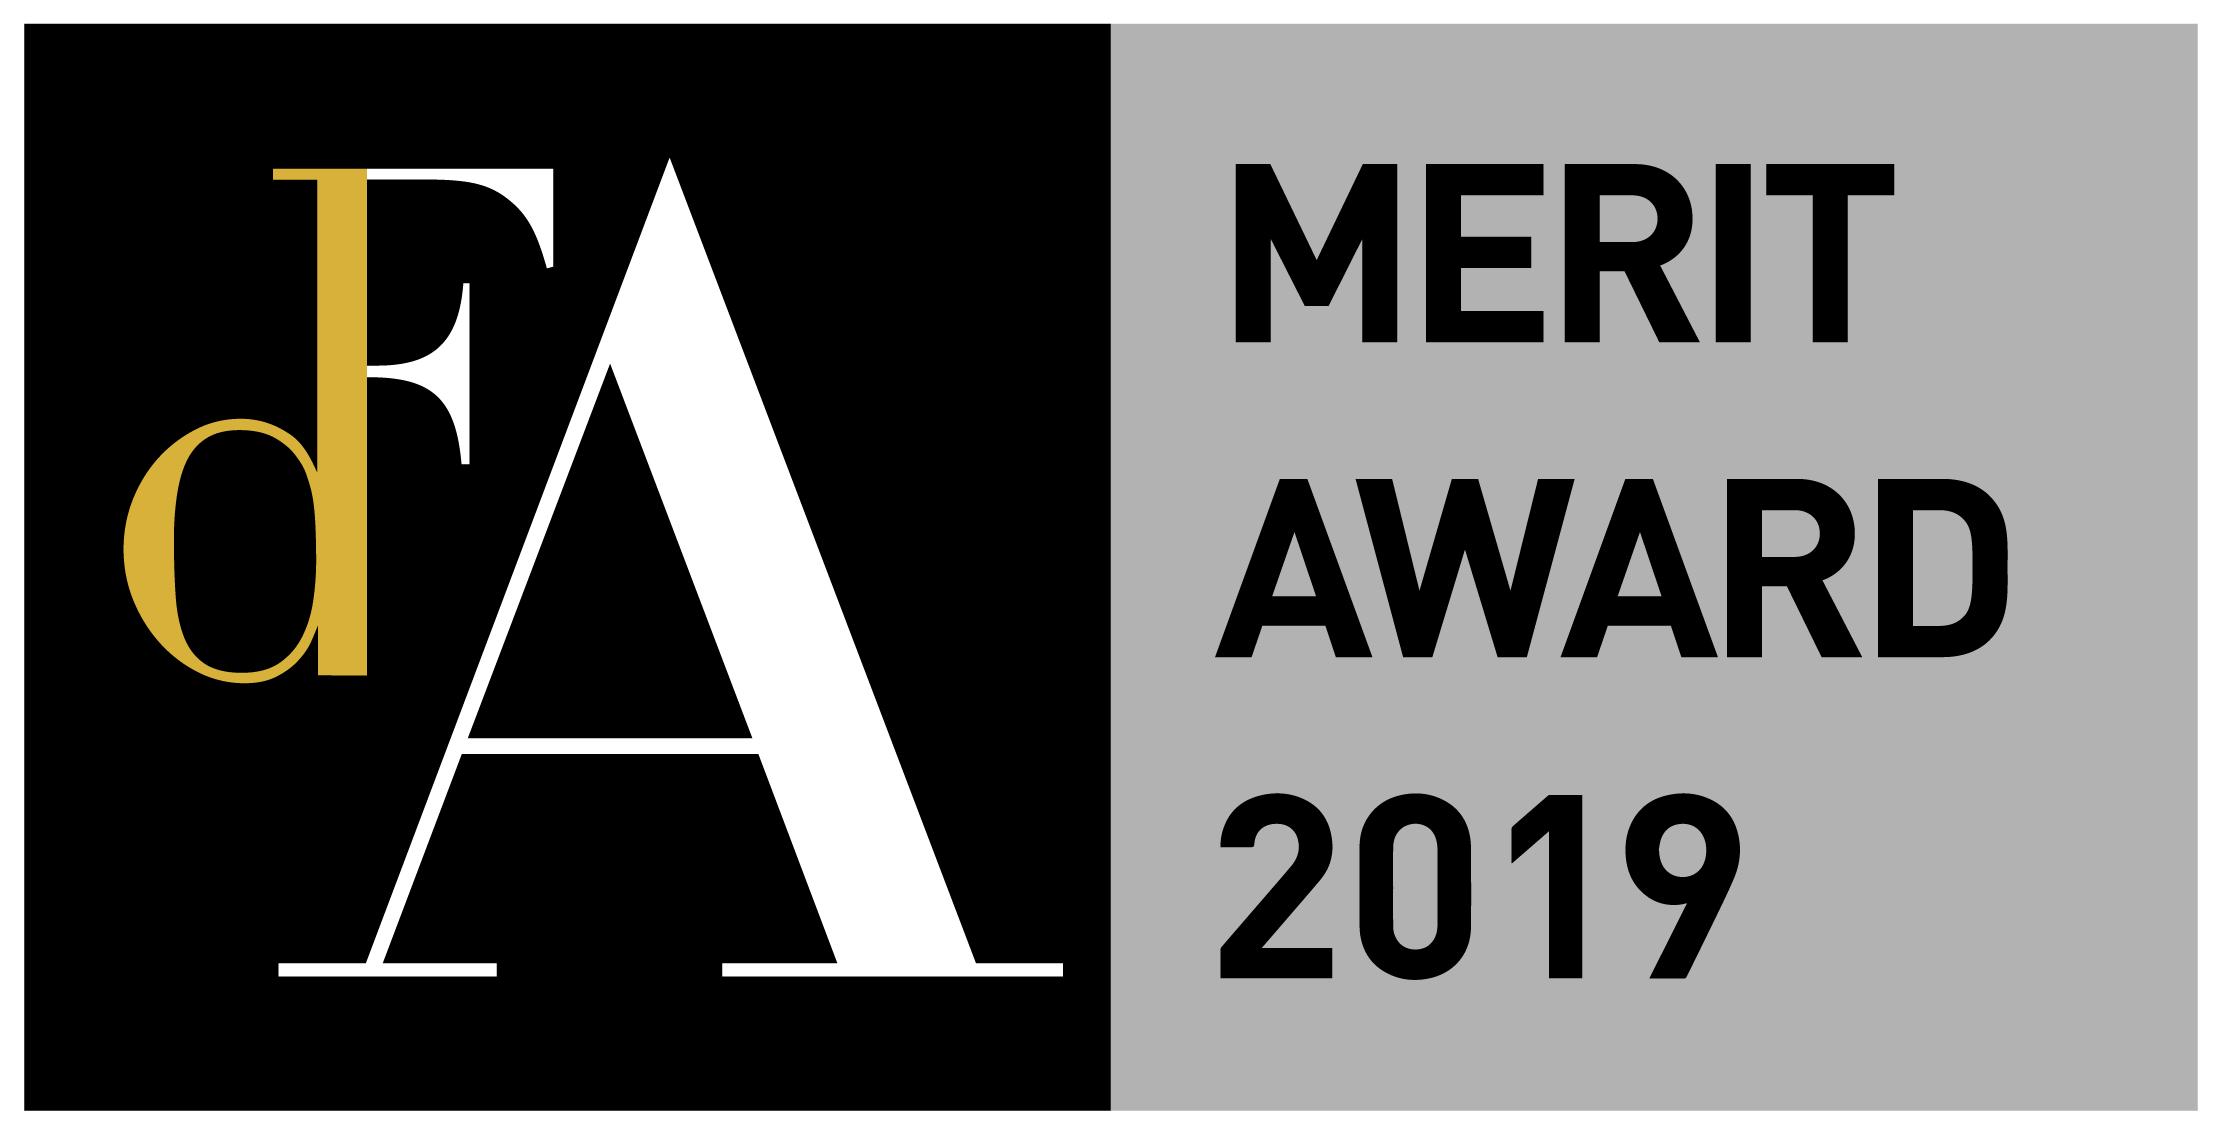 DFA Design for Asia Awards 2019 - Merit Award